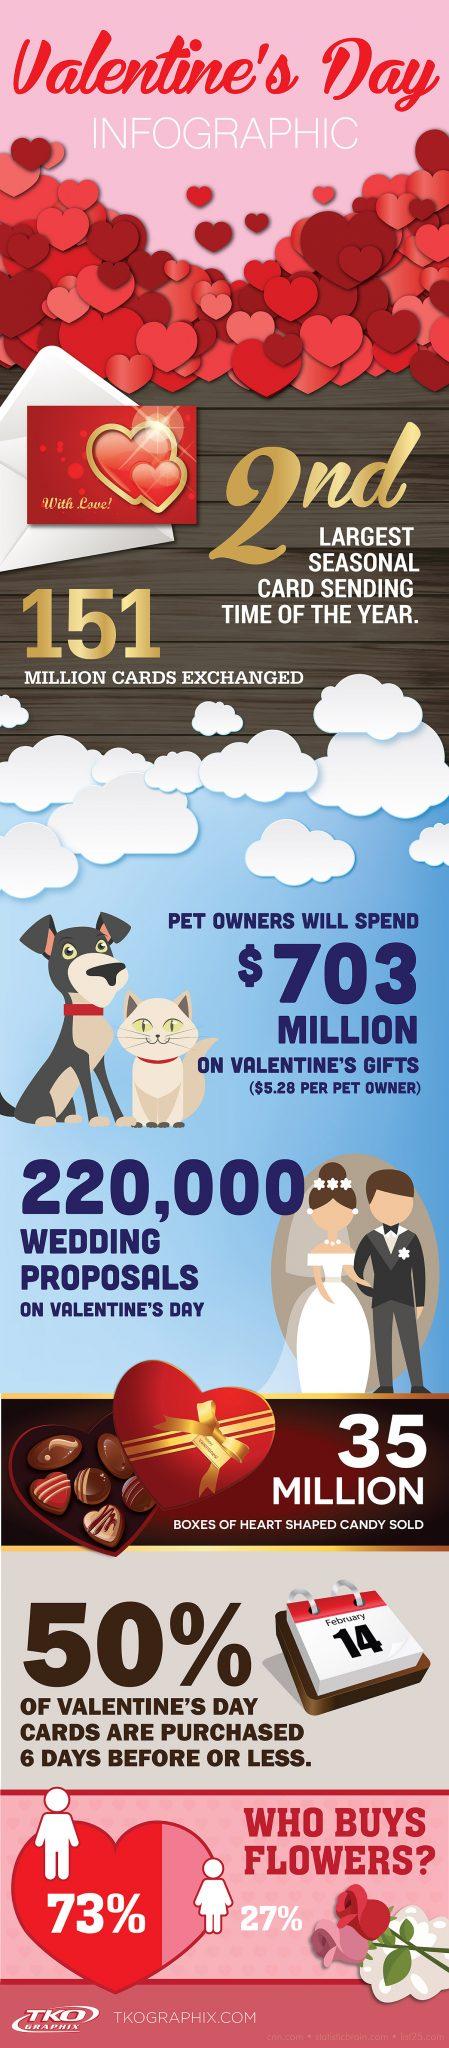 valentines-day-infographic-by-TKO-Graphix